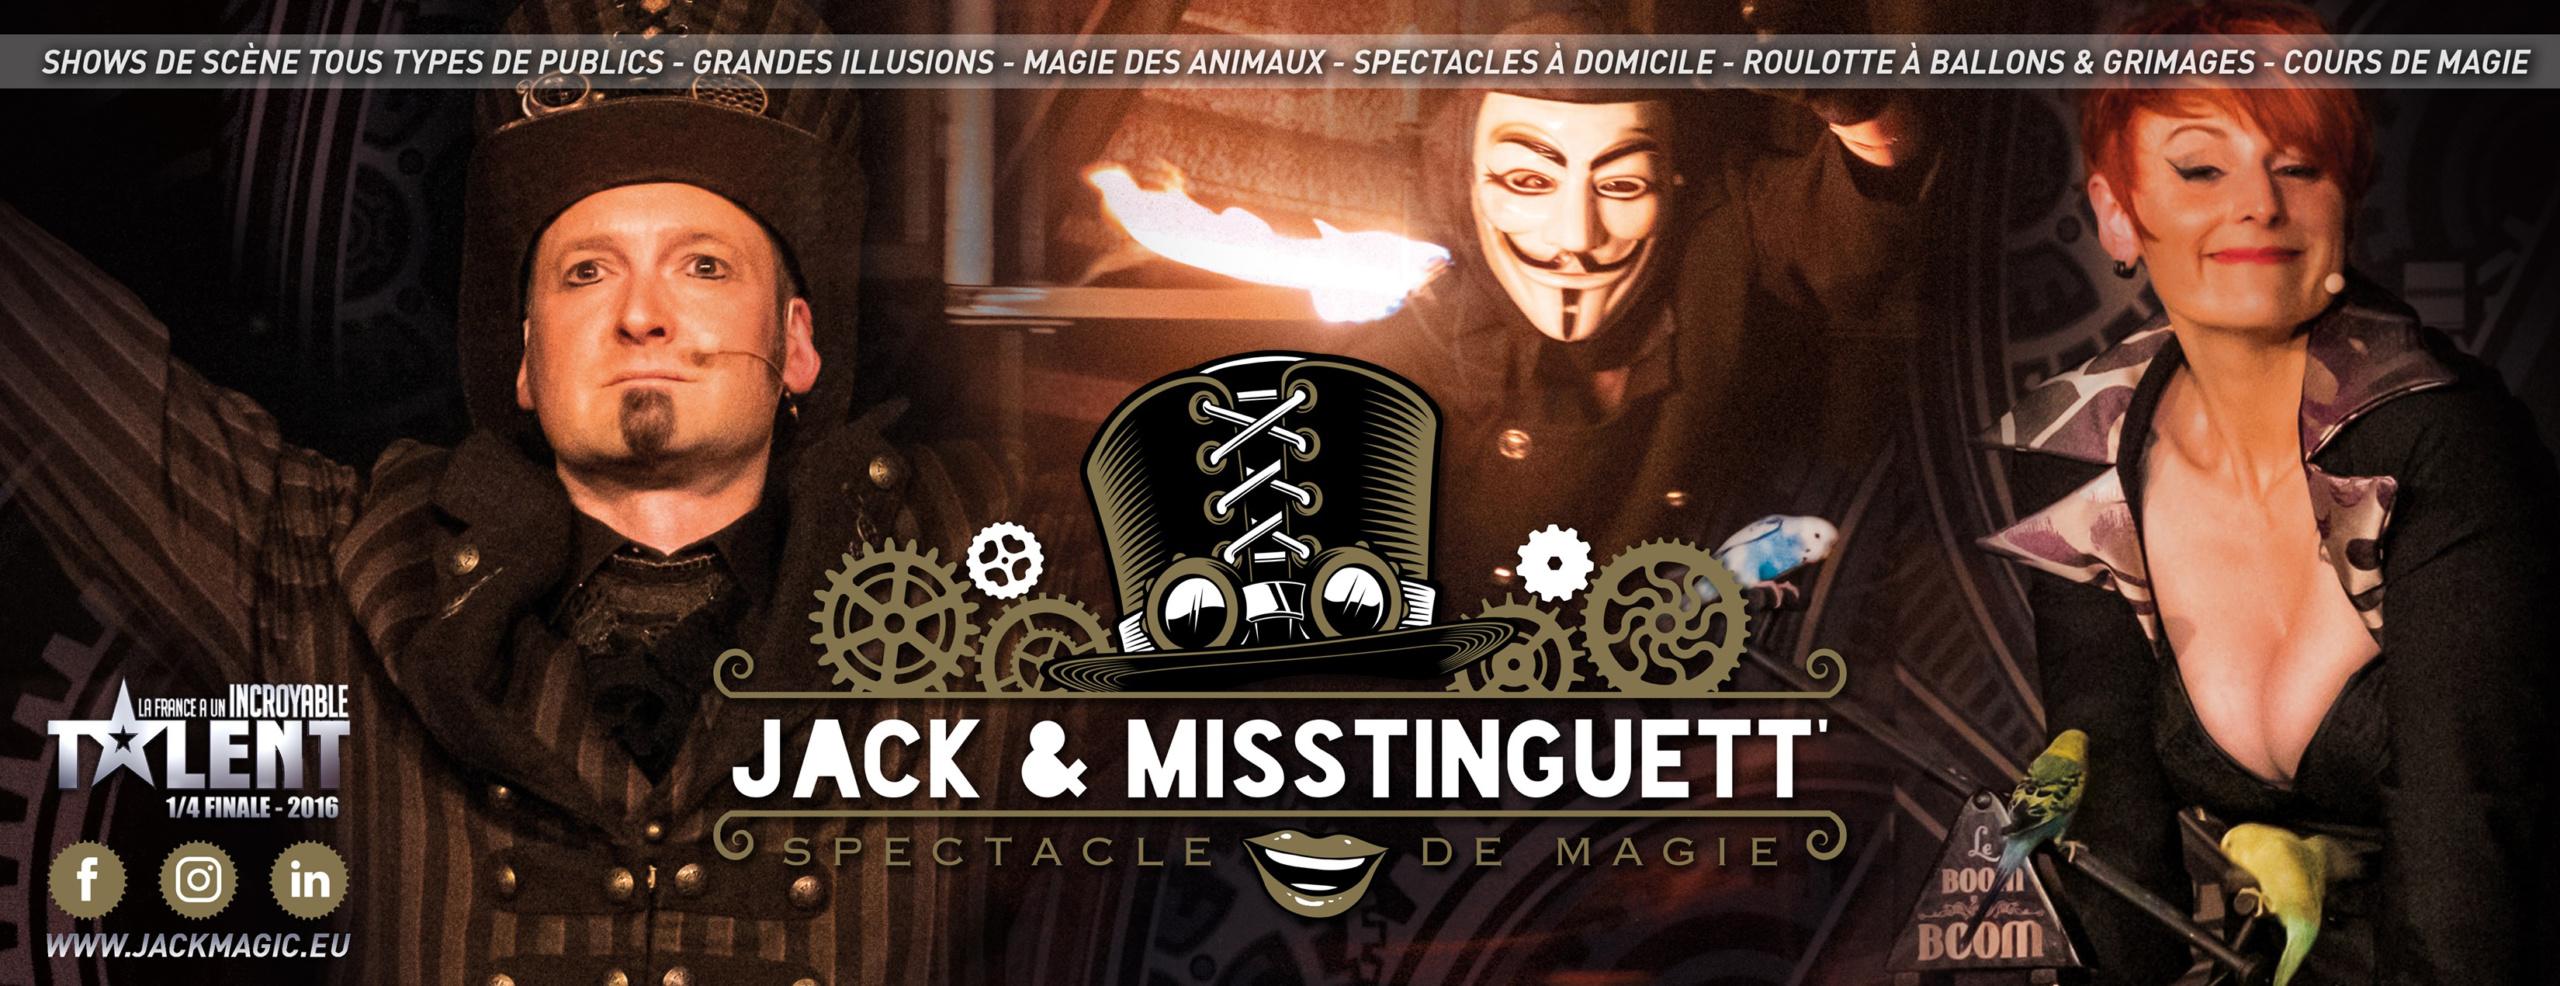 Jack & Misstinguett' – MAGICIENS